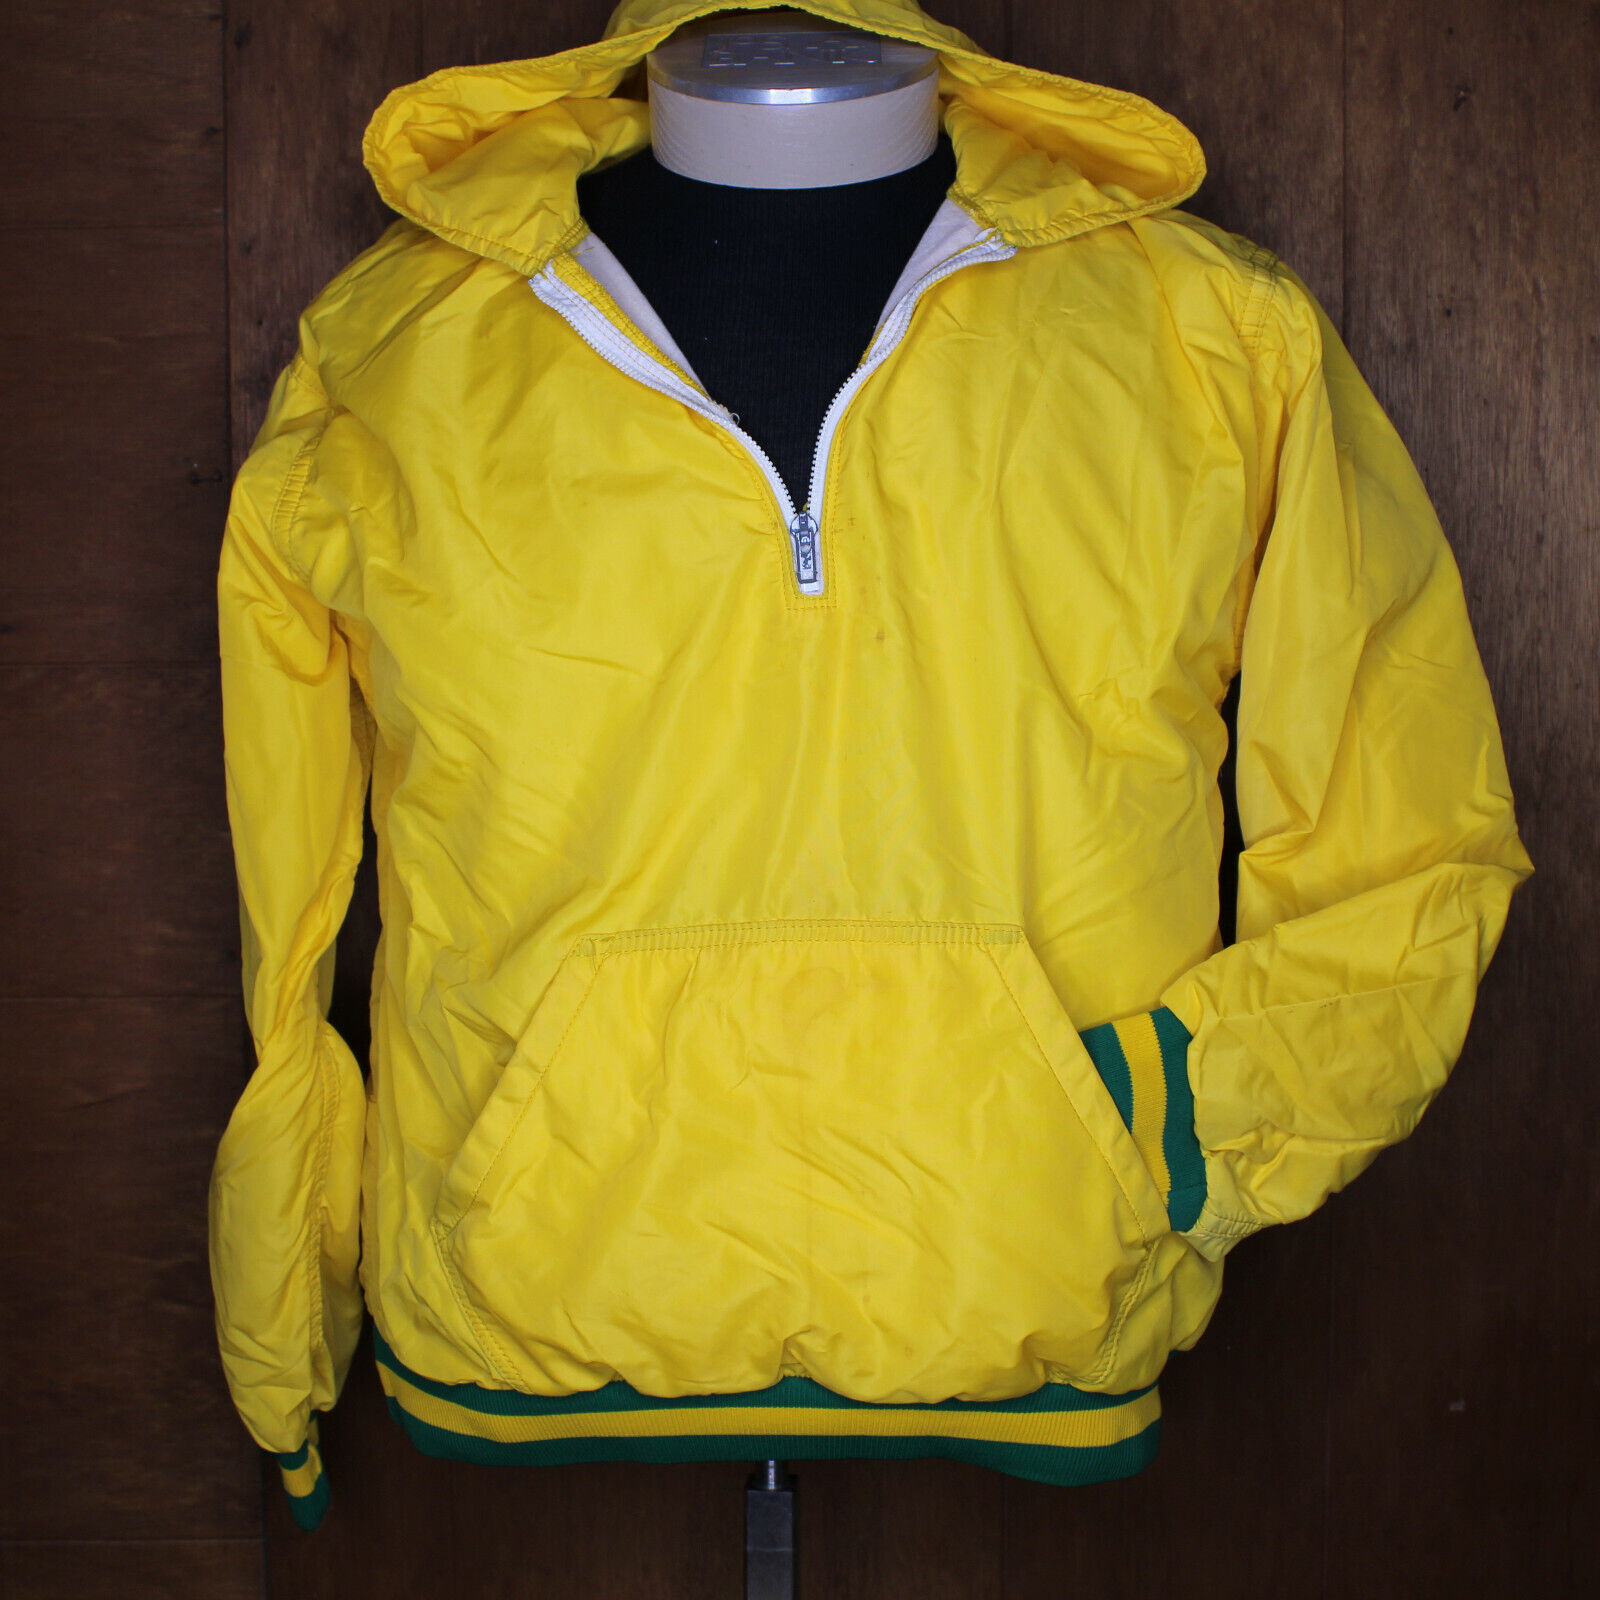 VTG 70s Russell Zip Hooded Jacket Medium School C… - image 2